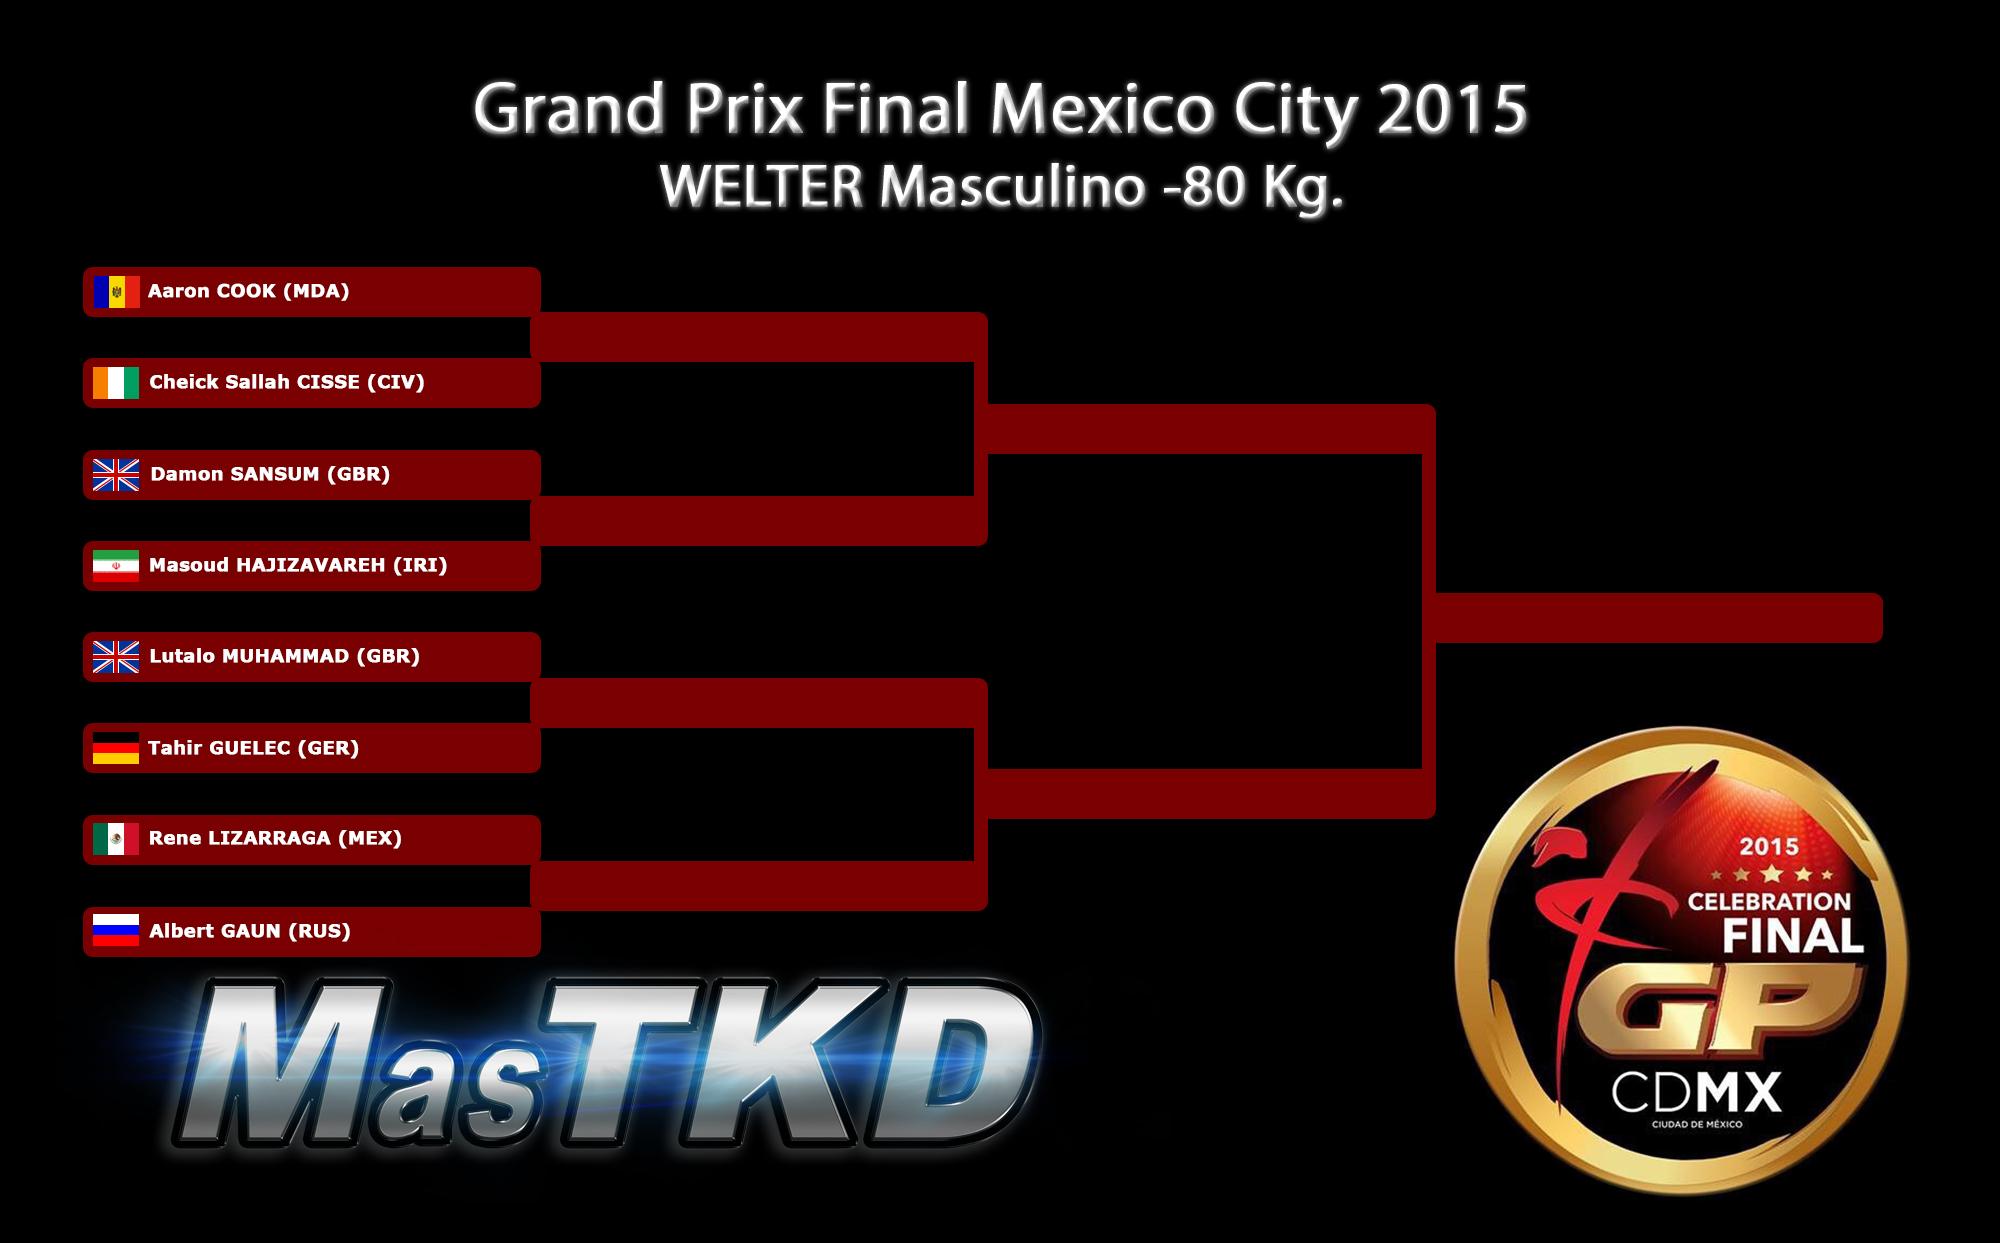 M-80_Grafica_GPFinal_MexicoCity2015